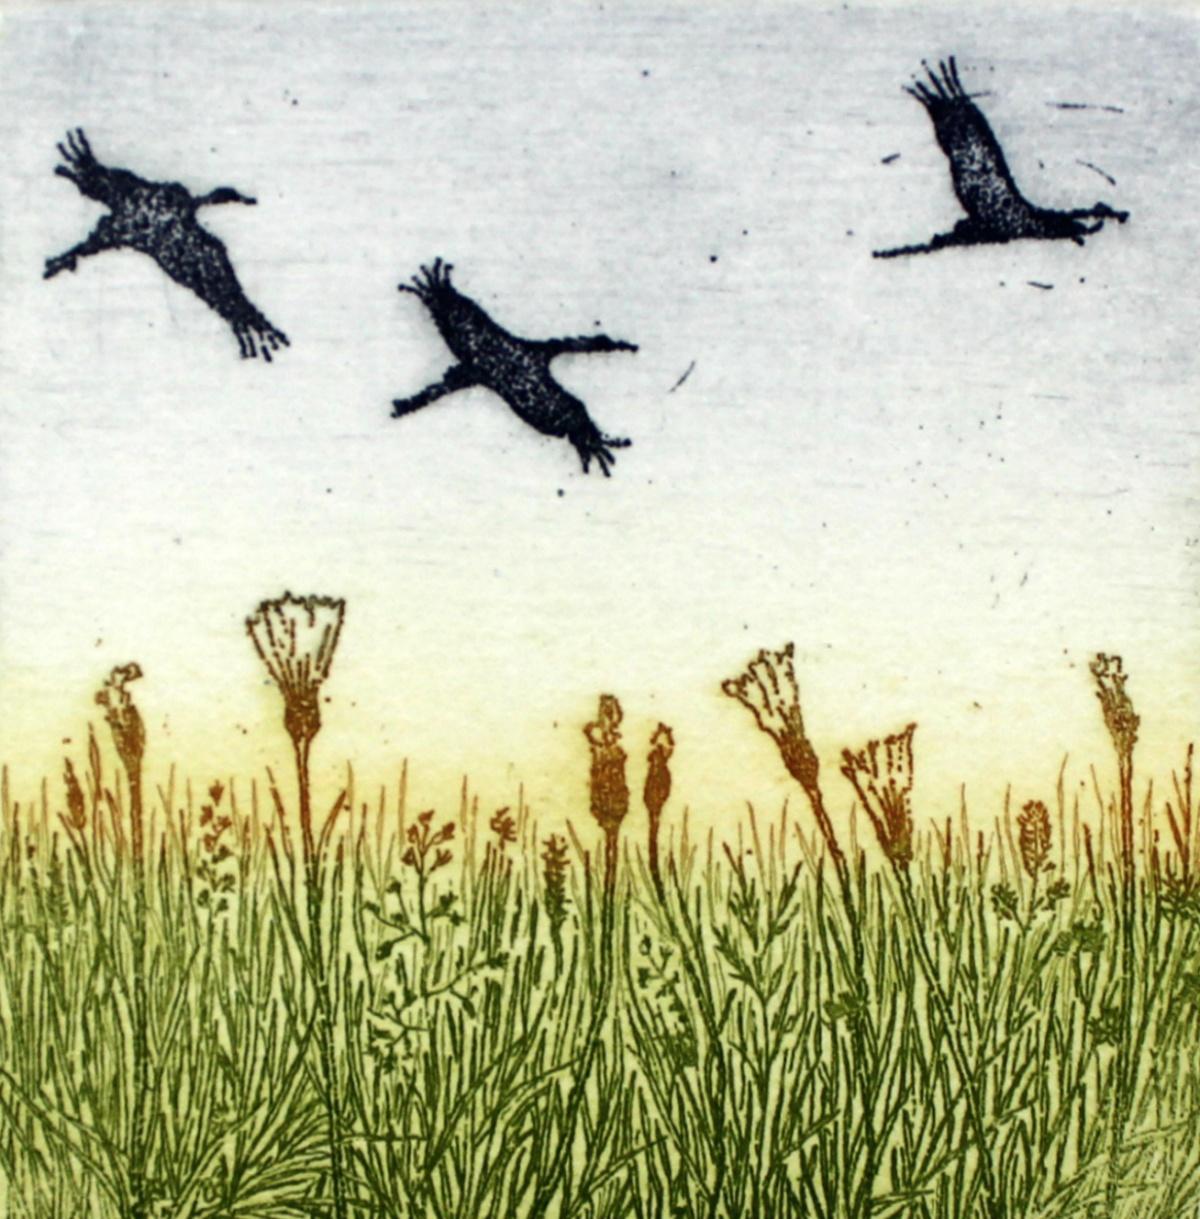 Arrivals - XXI century, Figurative etching, Birds, Colourful